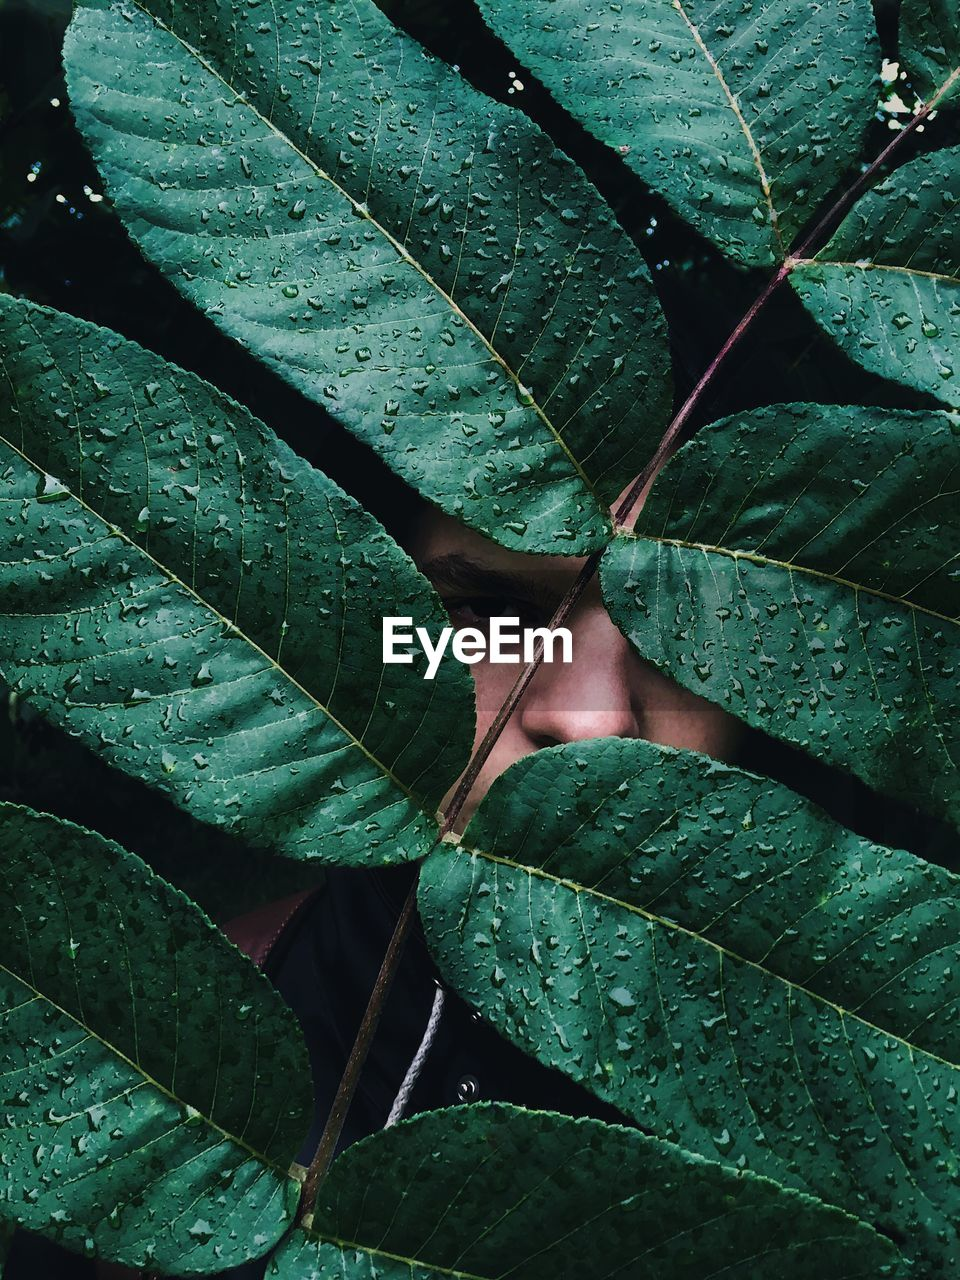 Portrait Of Man Looking Through Wet Plants